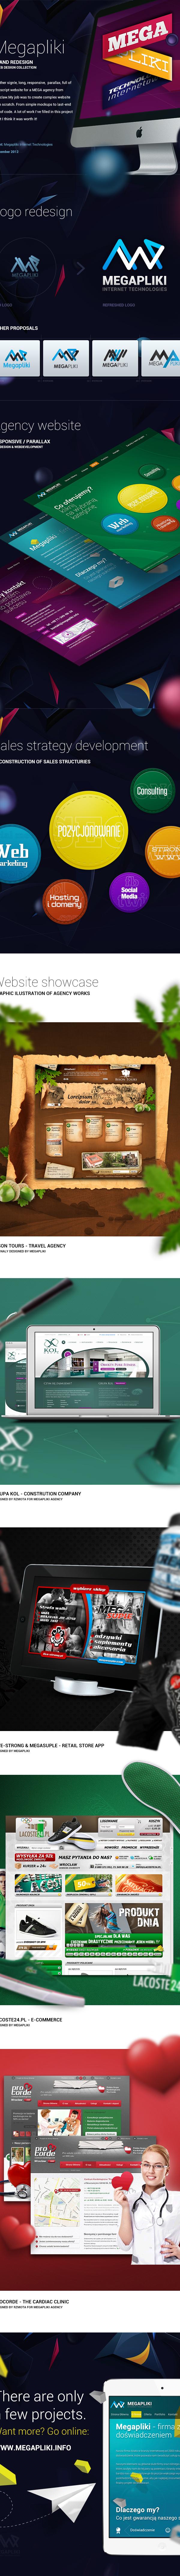 Webdesign Webdevelopment parallax Responsive rwd js agency megapliki rzmota graphic portfolio